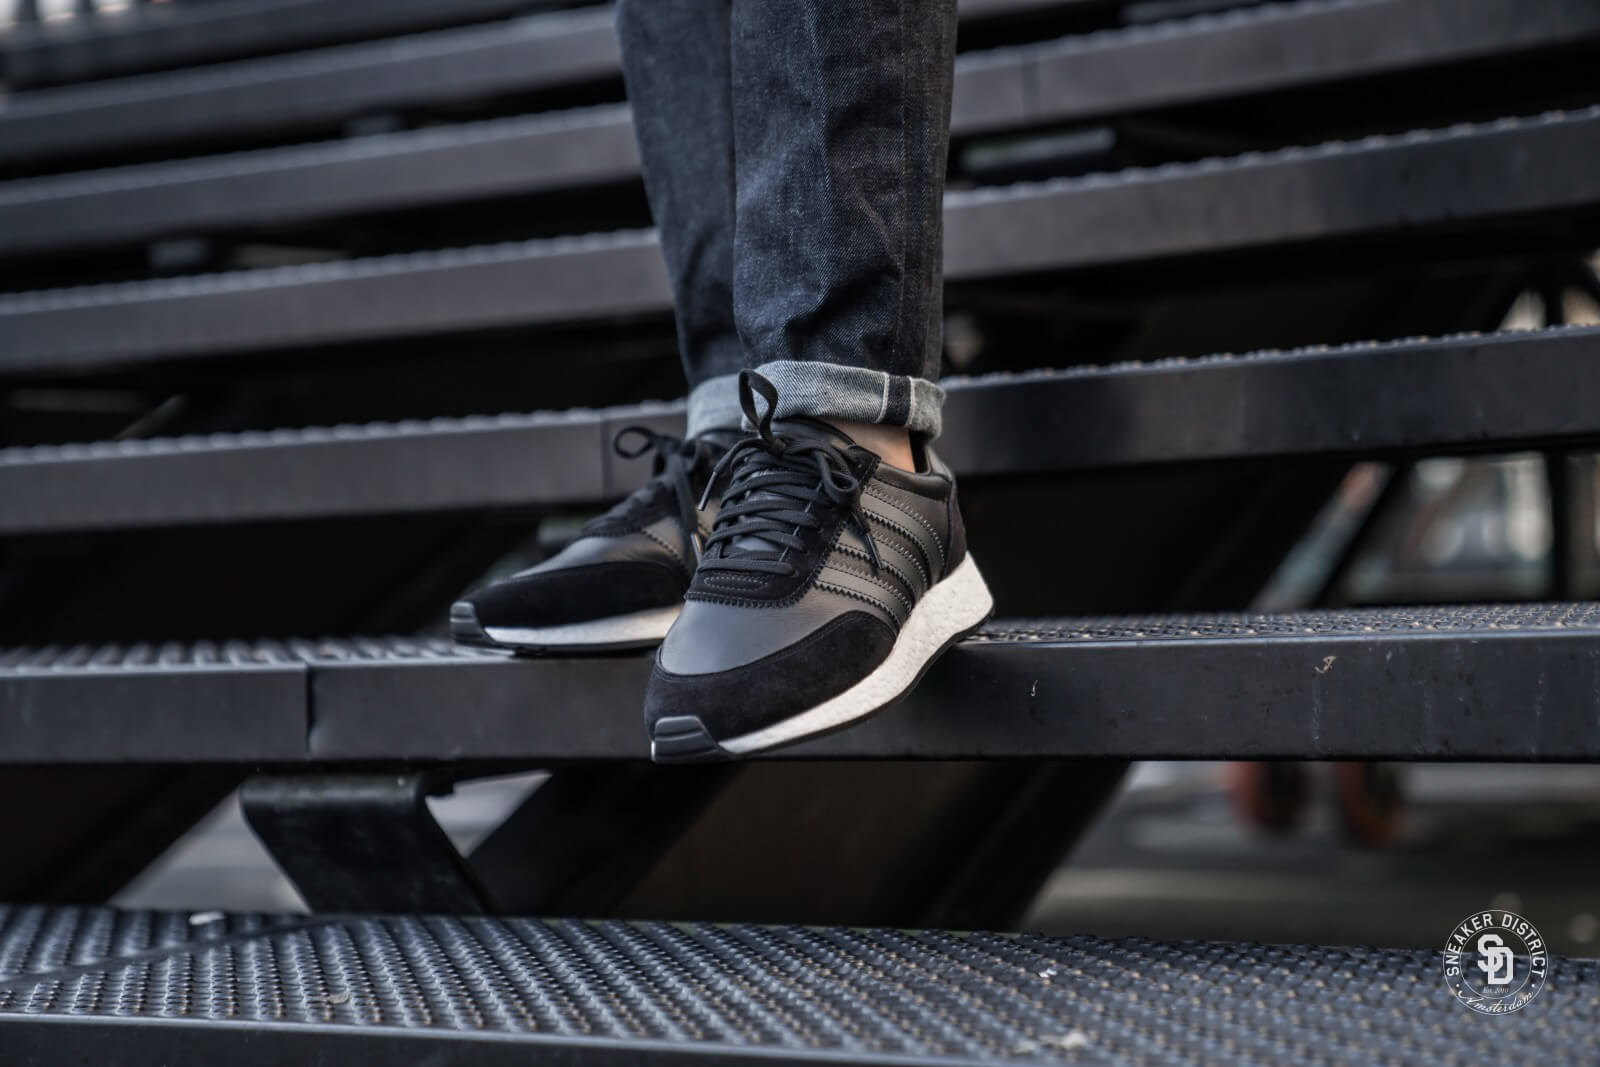 Adidas I-5923 Core Black/Carbon